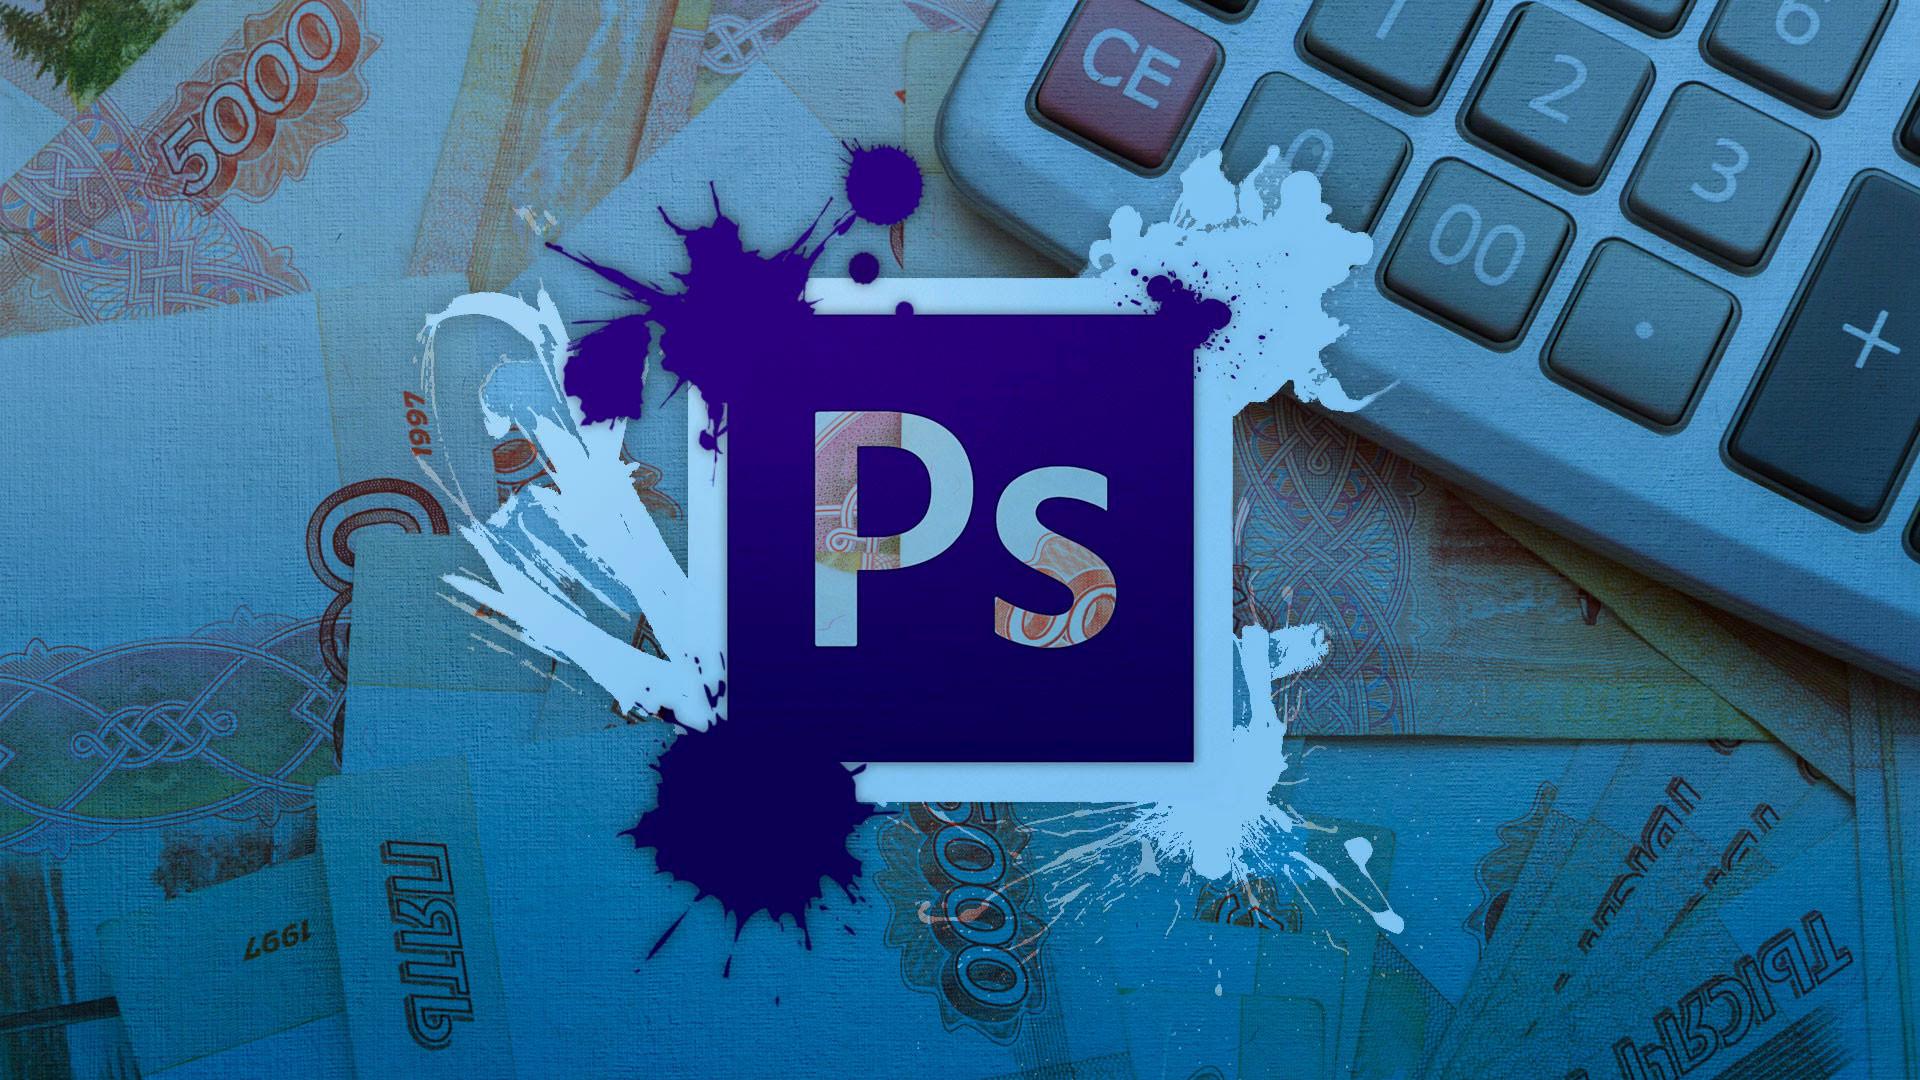 <p>Коллаж &copy; L!FE. Фото: &copy; Shutterstock Inc</p>